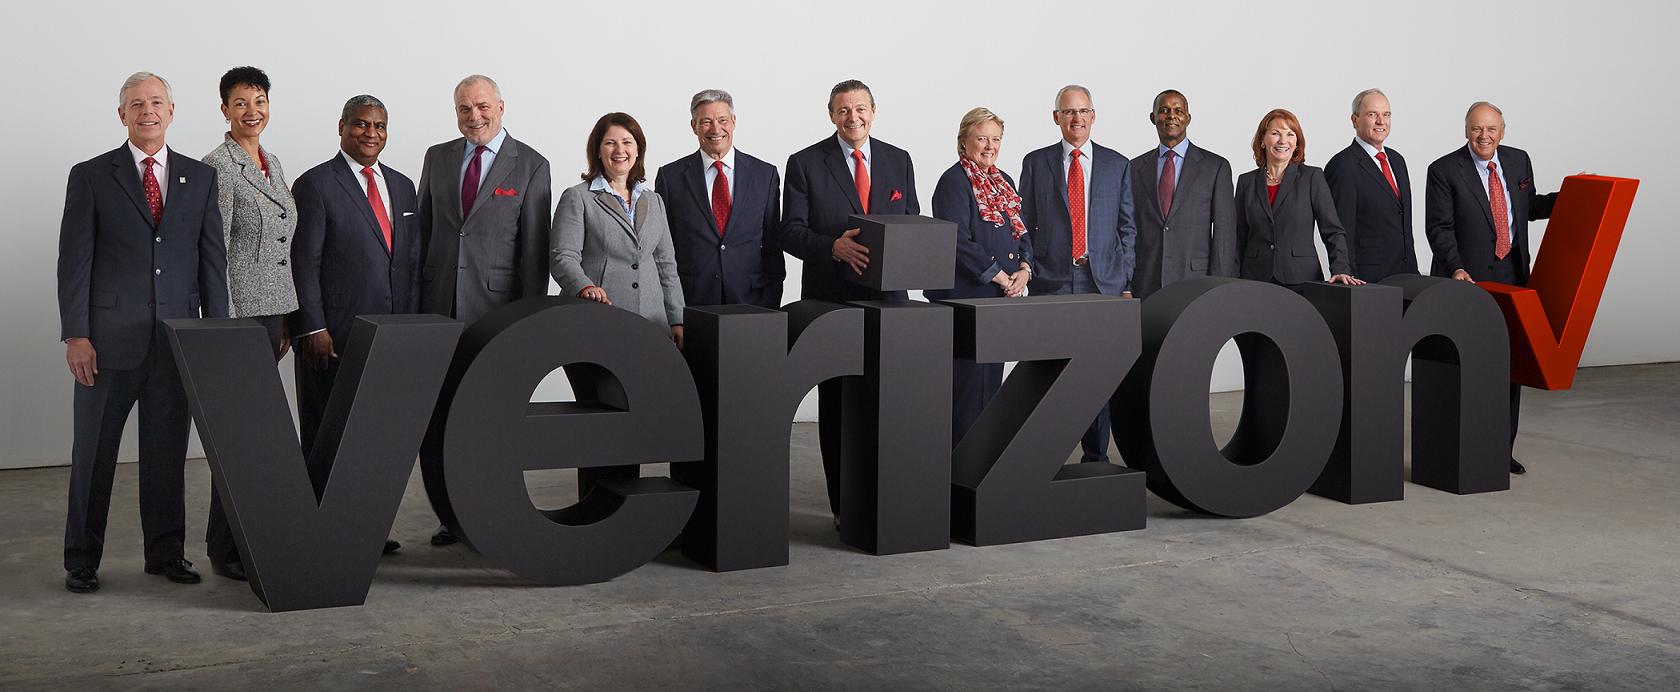 13 executives standing behind the Verizon logo.